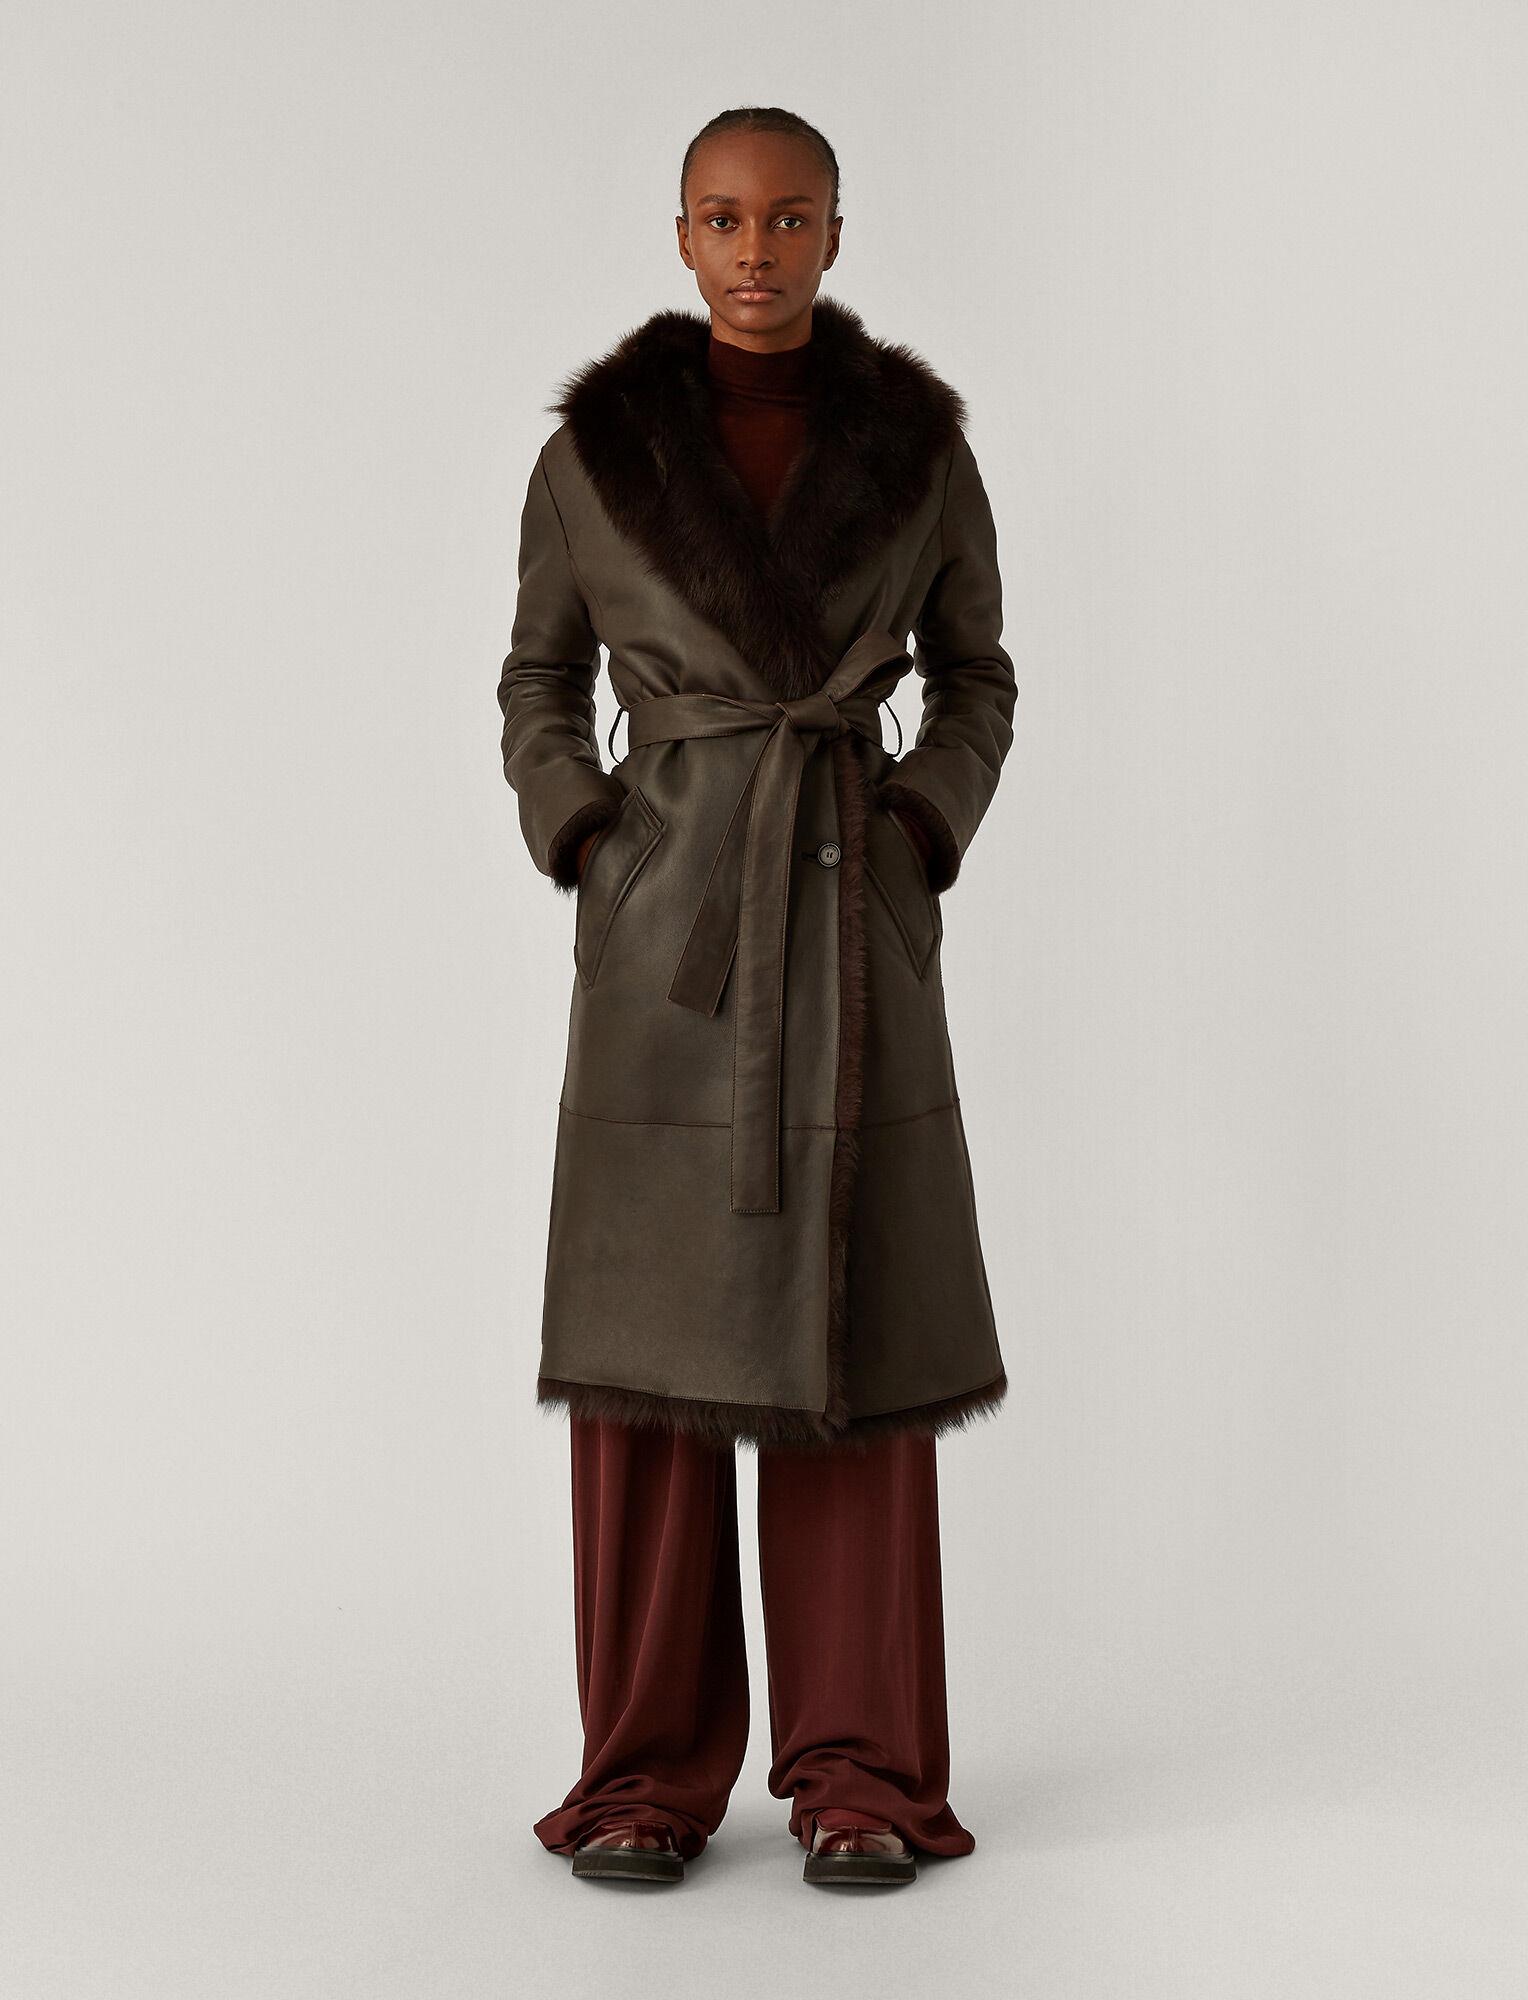 Joseph, Cree New Toscana Sheepskin Coat, in Chocolate